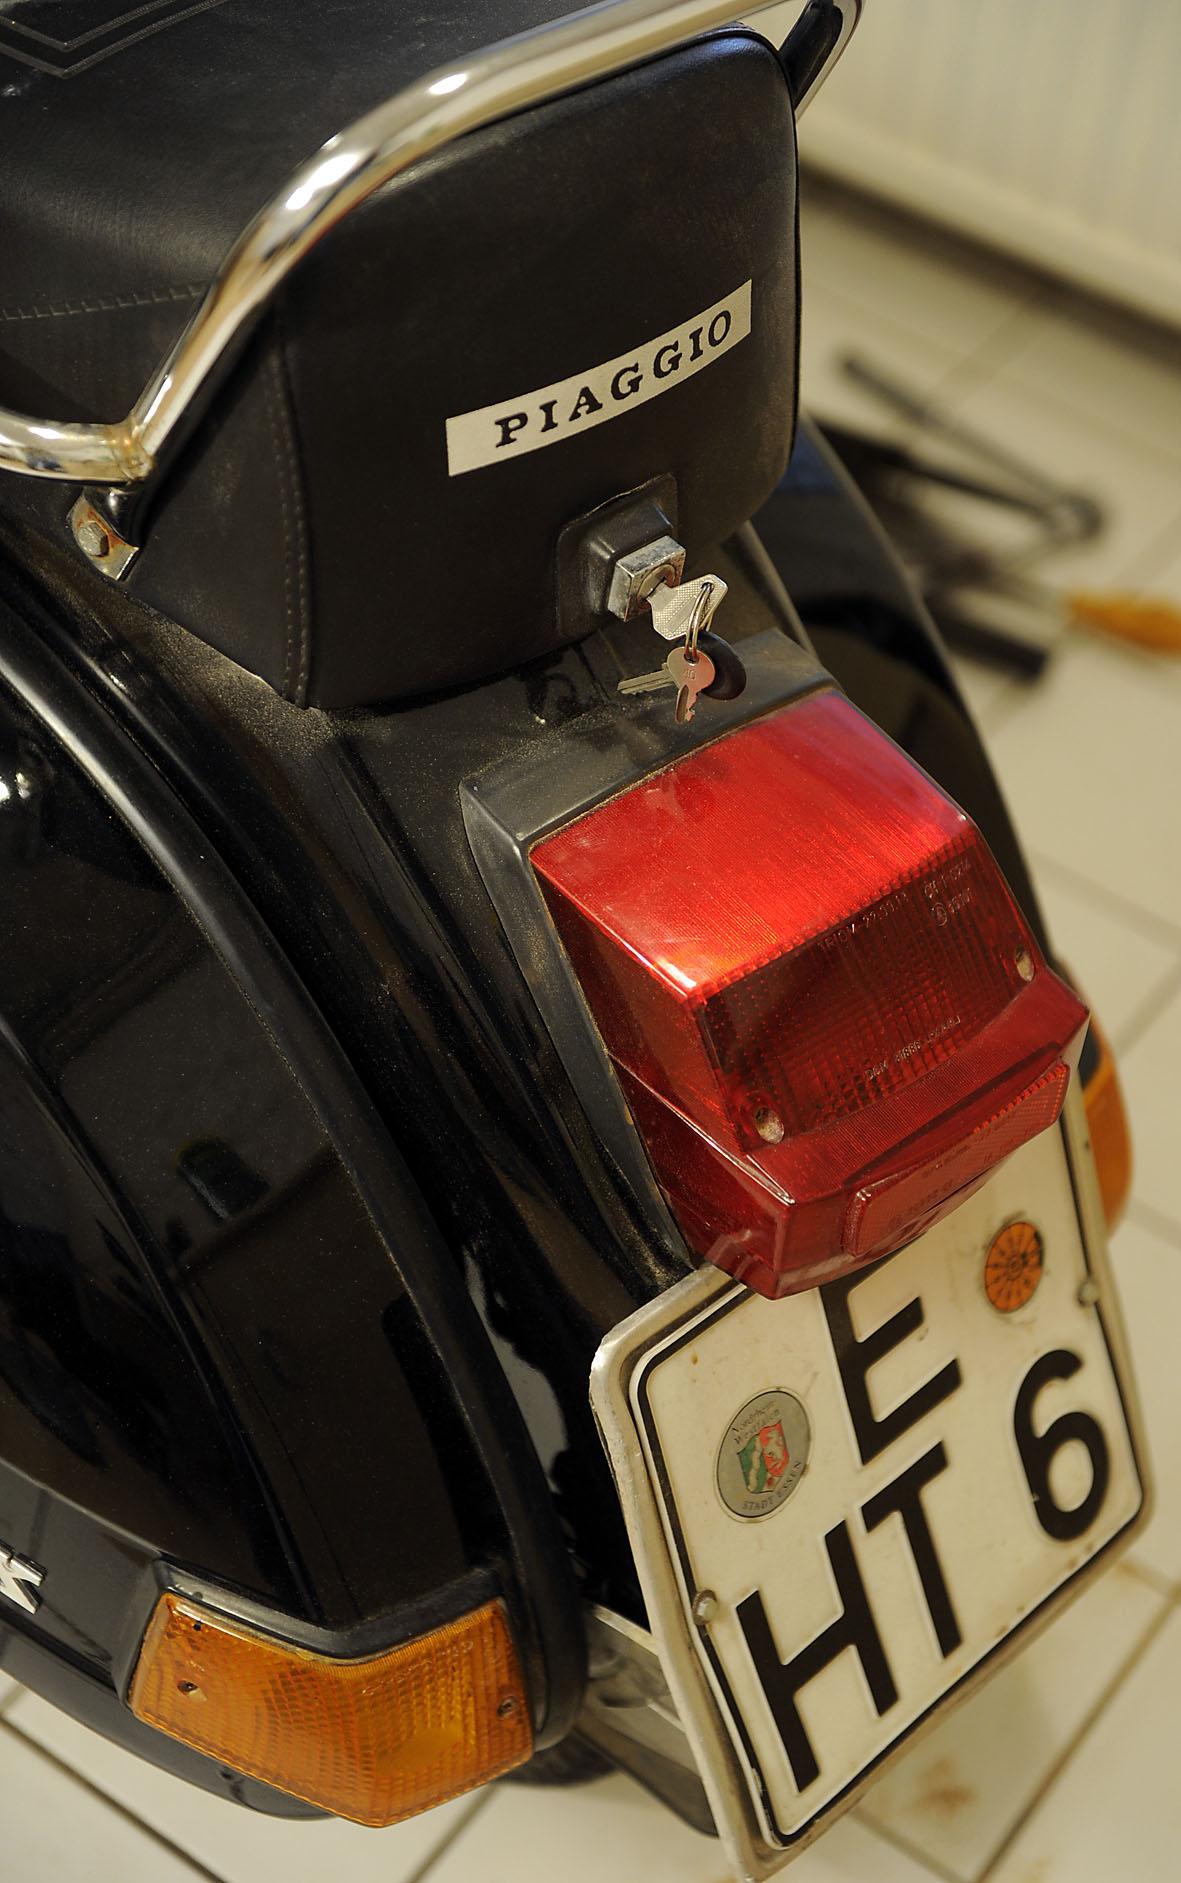 P80X mit 125-Kubiksatz, Bj. '82